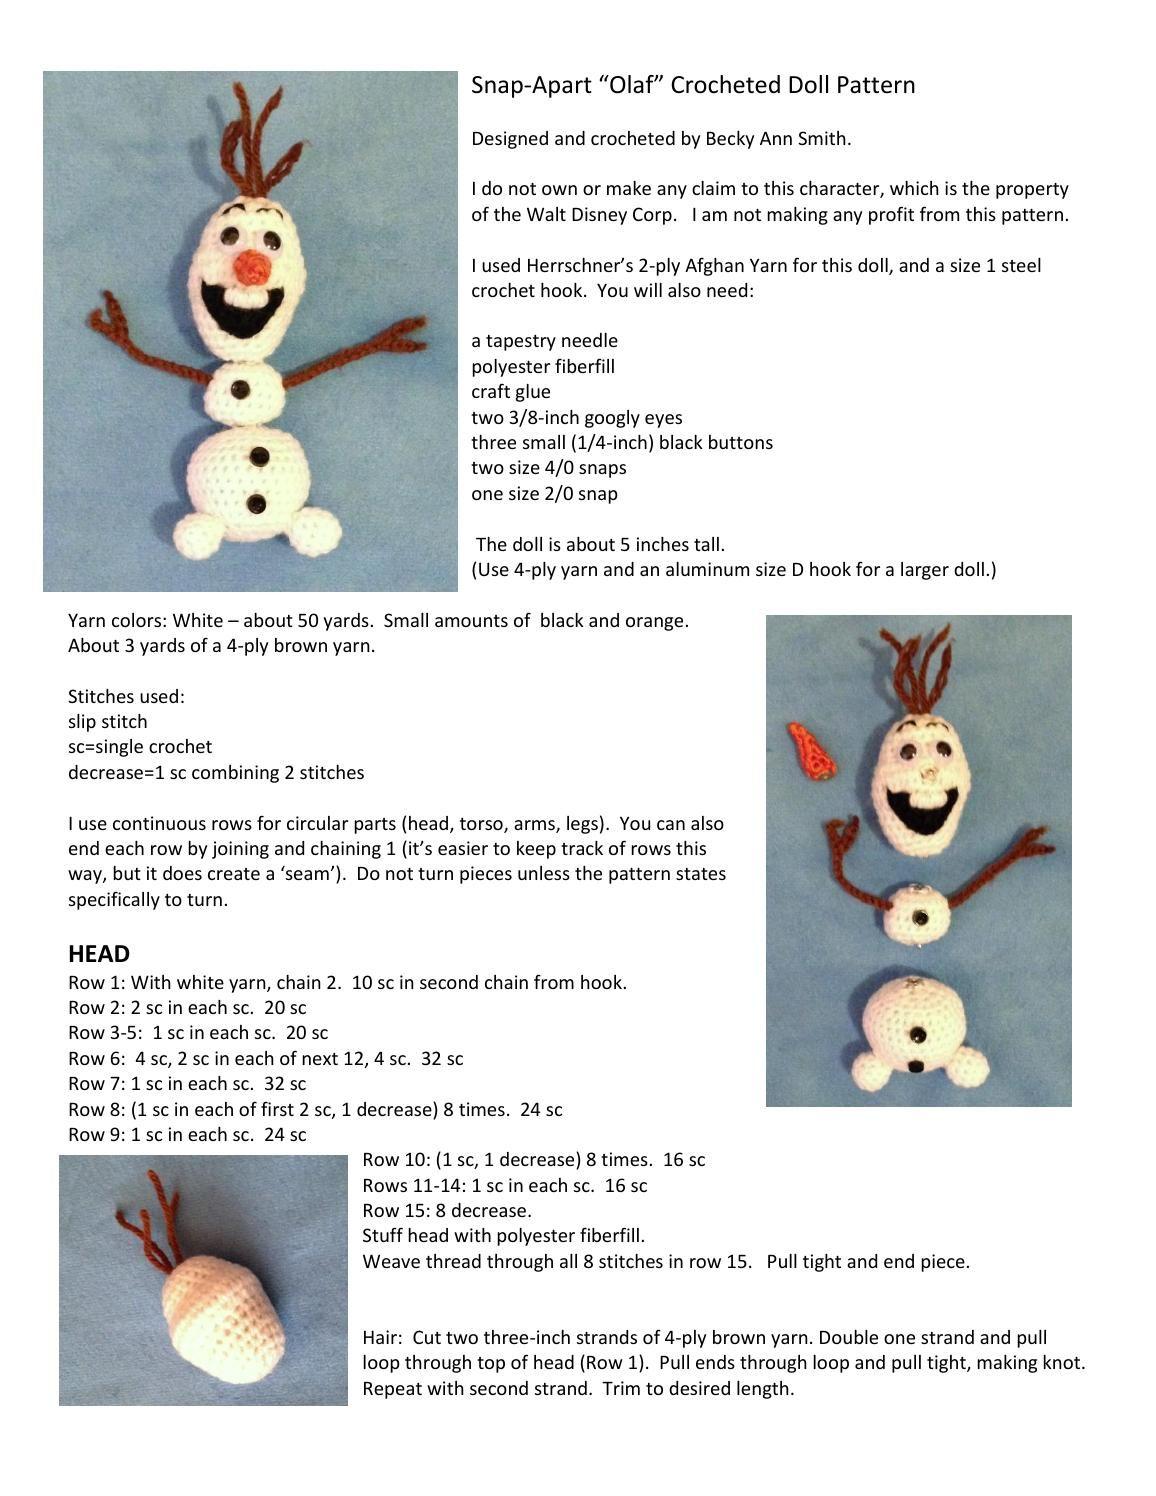 Olaf | Amigurumi,Toys,Etc. | Pinterest | Olaf, Amigurumi and Crochet